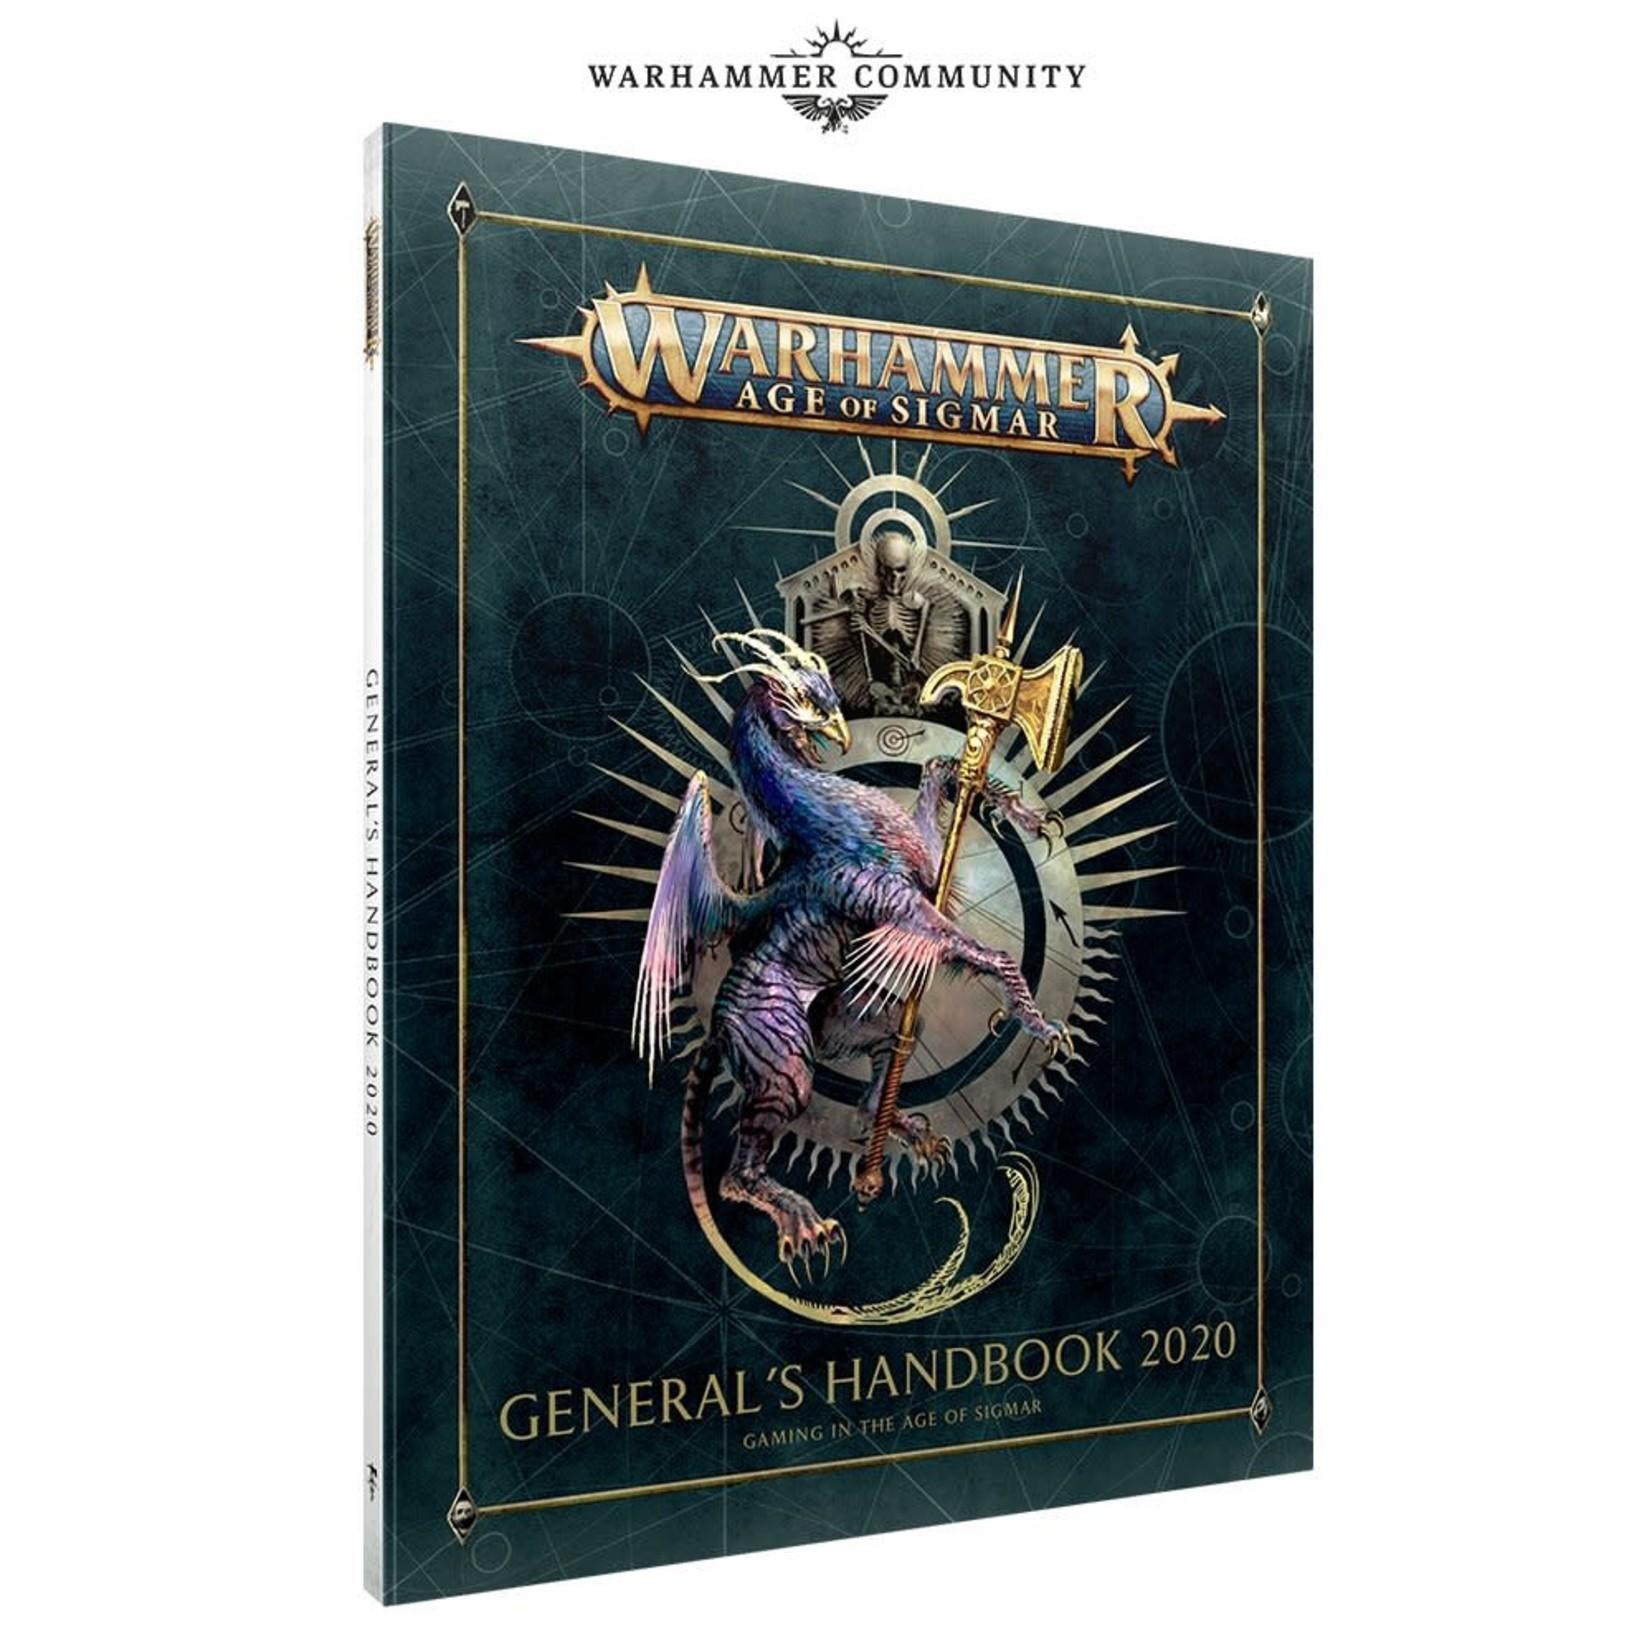 Games Workshop Warhammer: Age of Sigmar: General's Handbook 2020